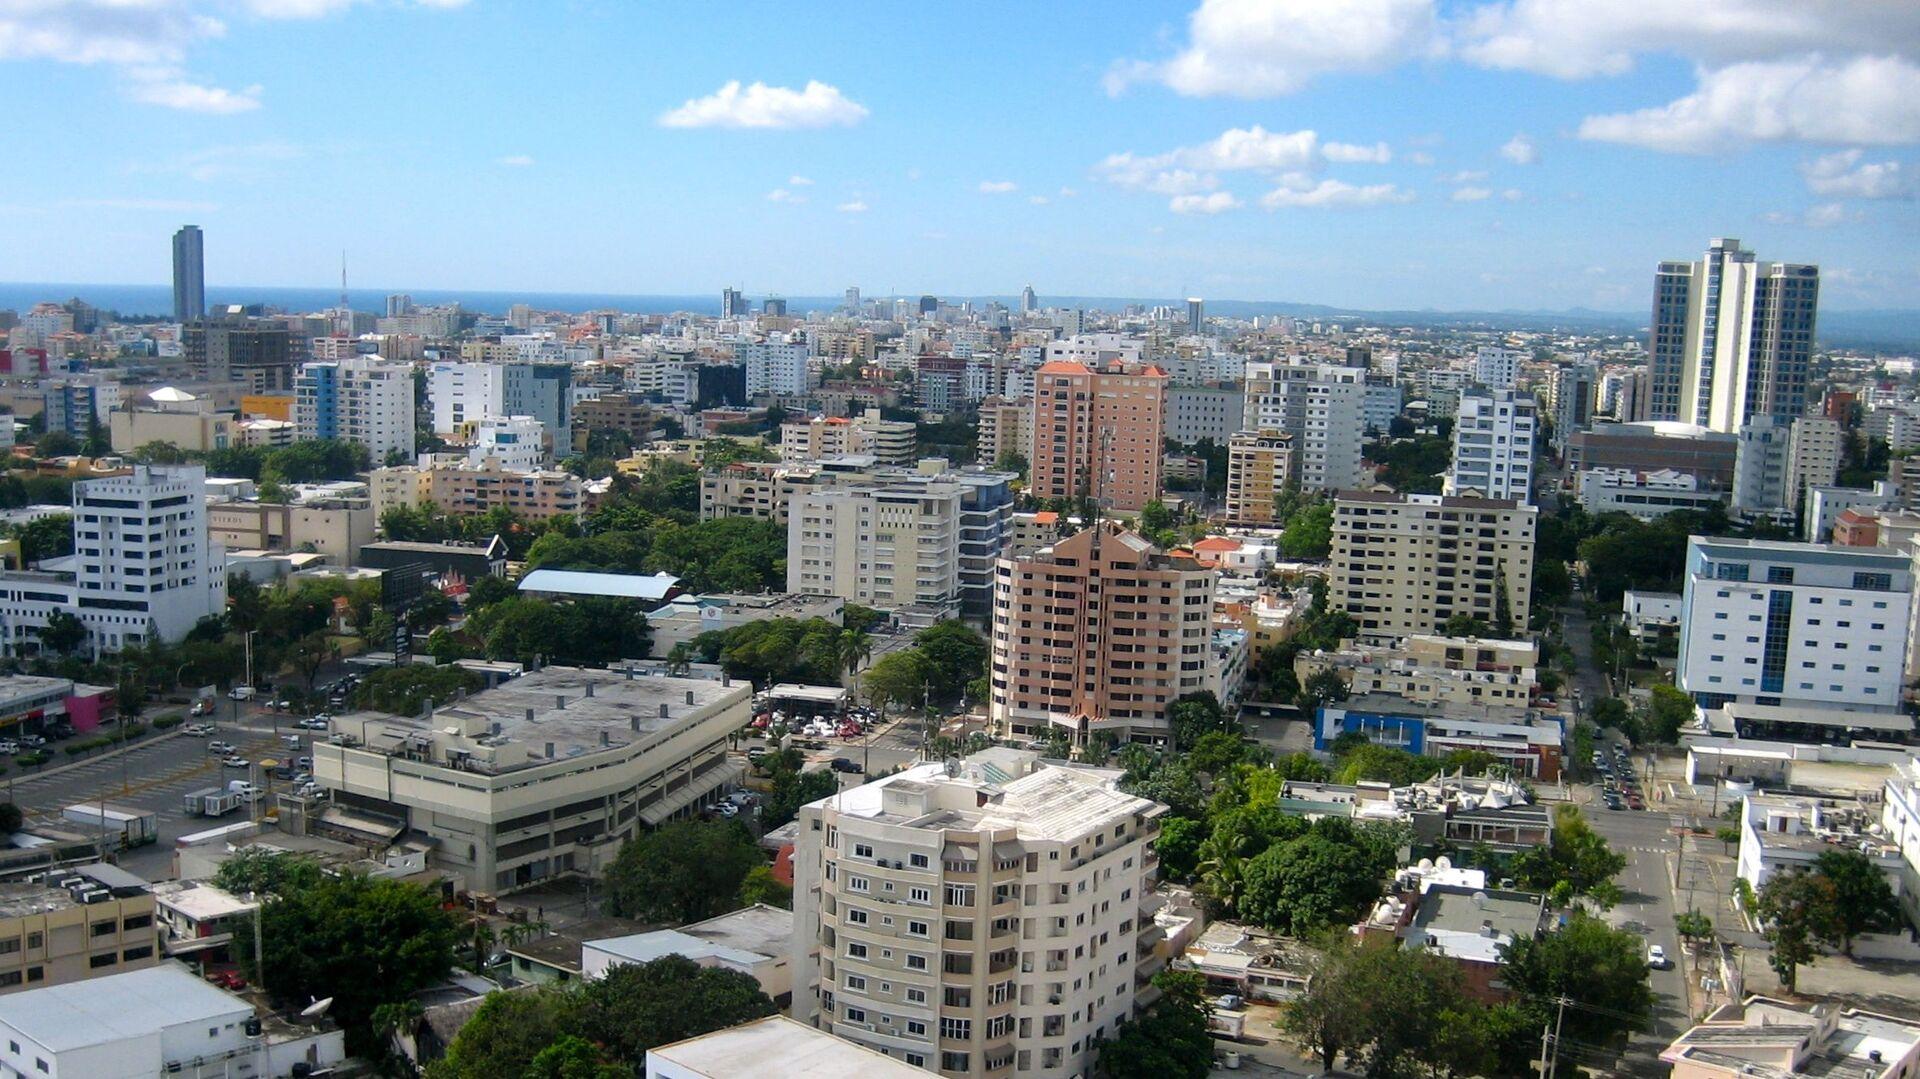 Santo Domingo de Guzmán, capital de la República Dominicana  - Sputnik Mundo, 1920, 11.08.2021